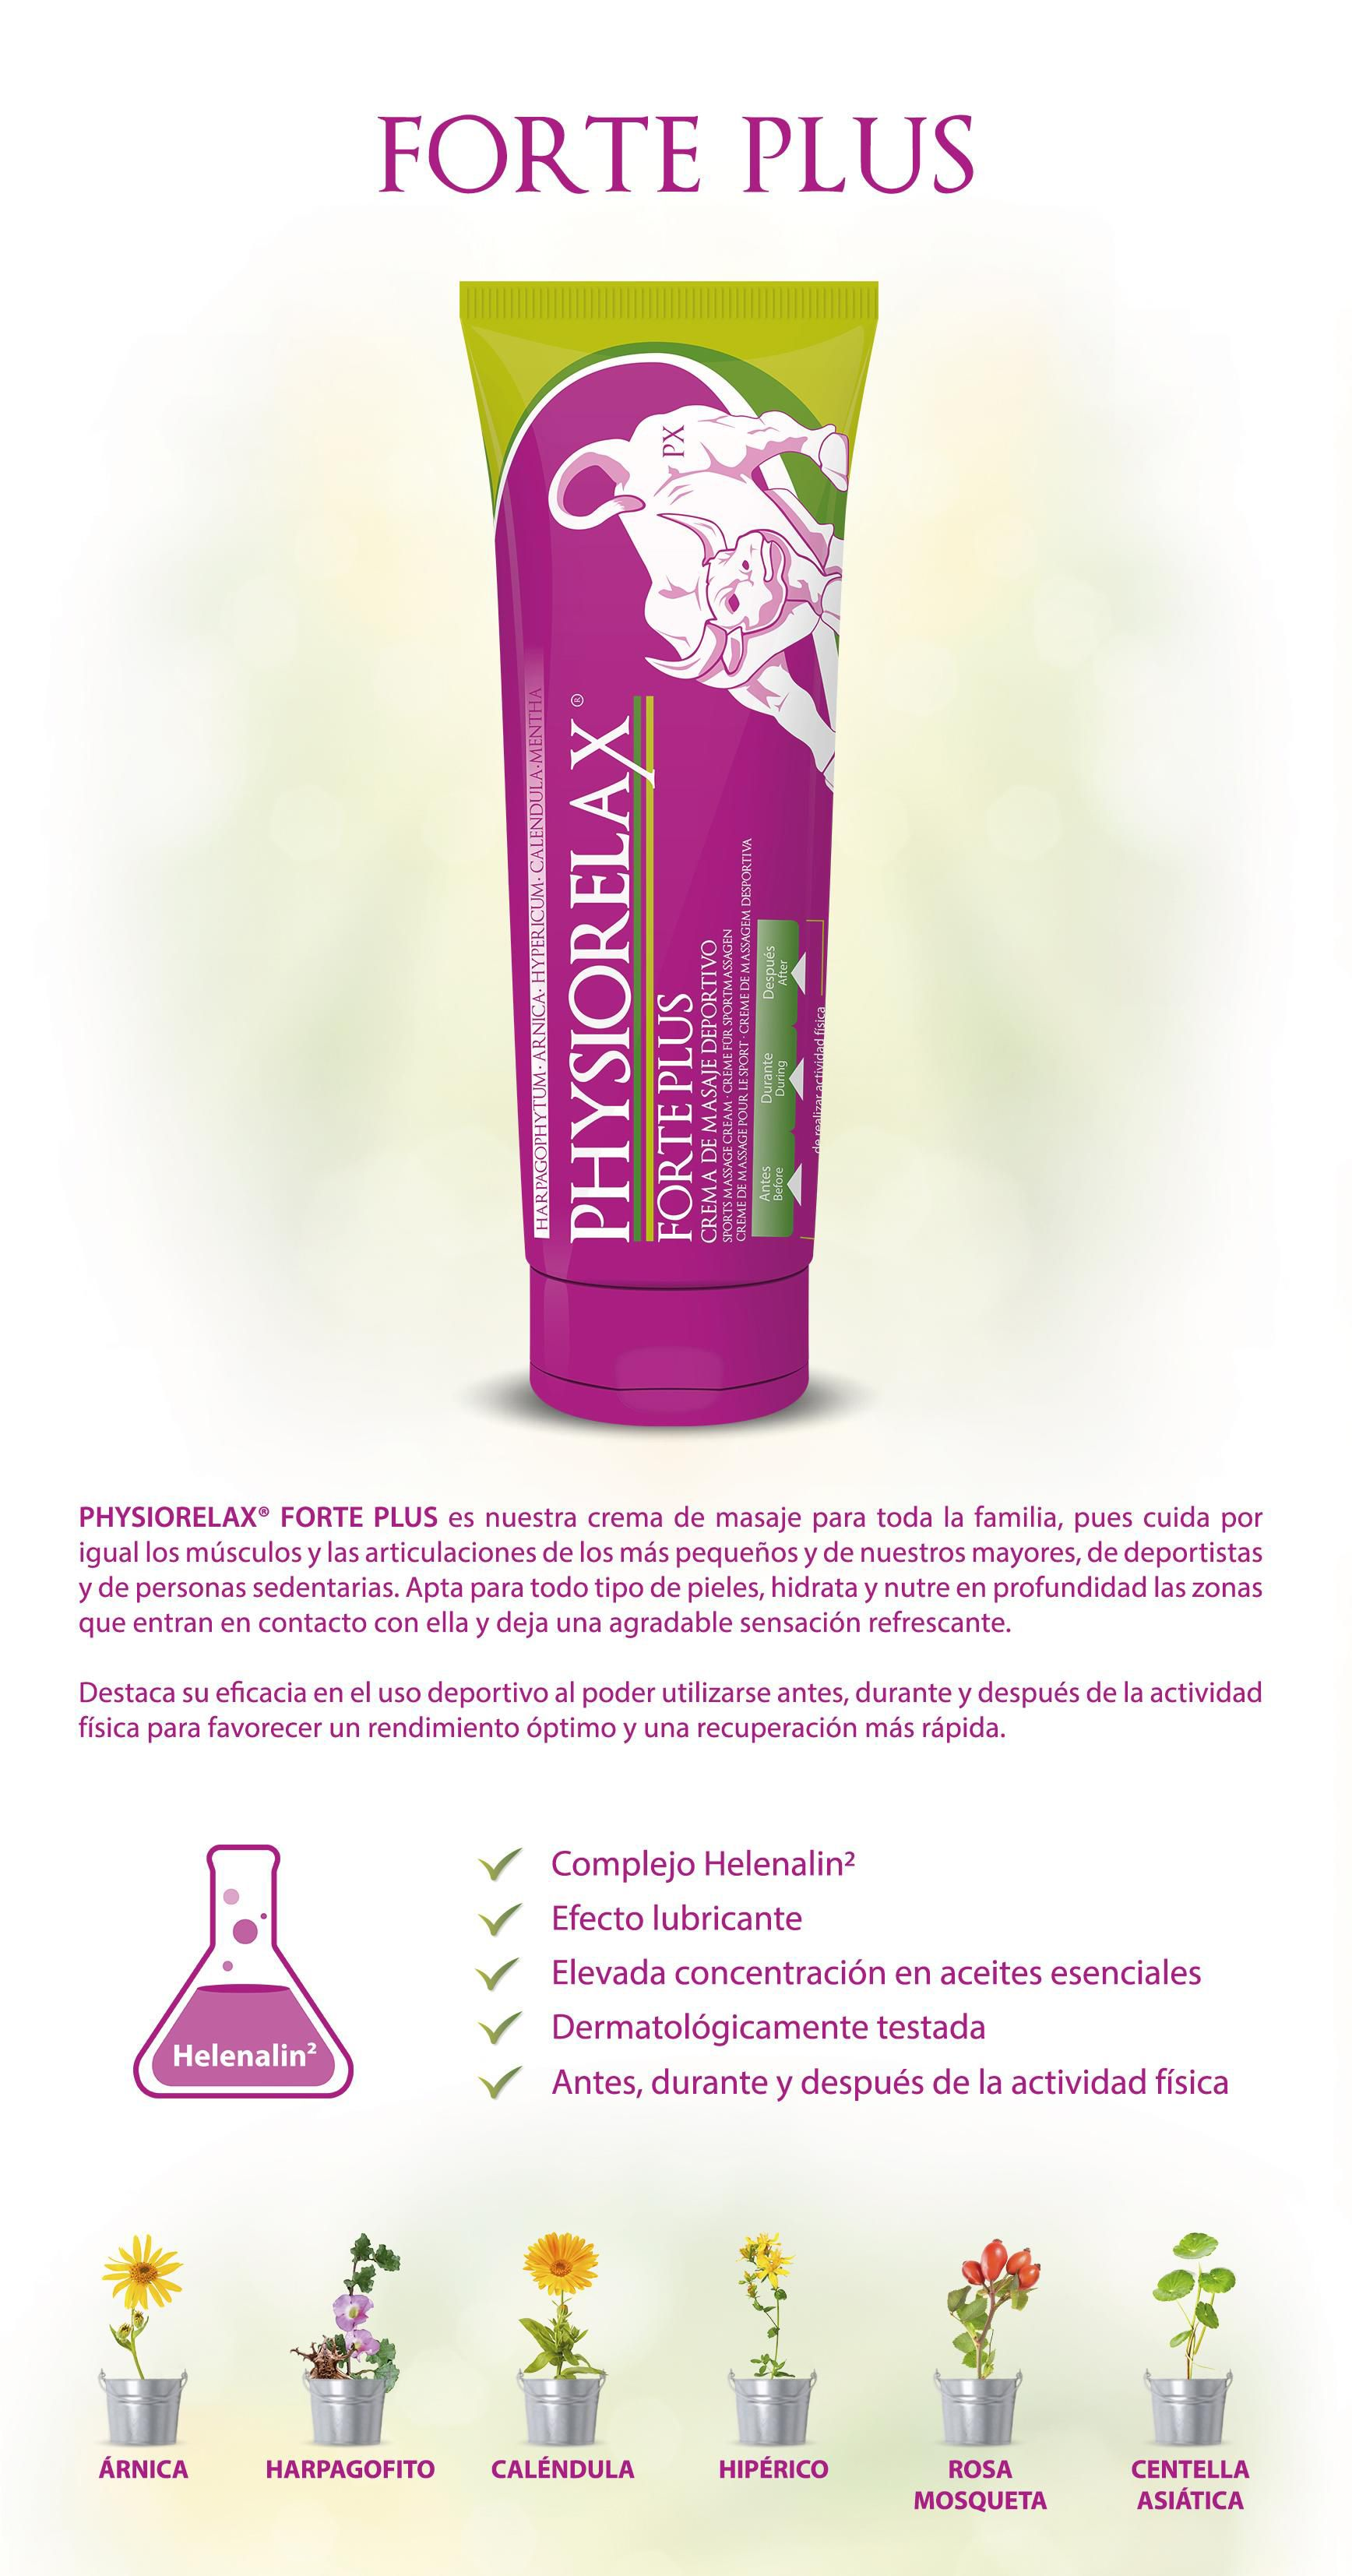 Physiorelax Forte Plus